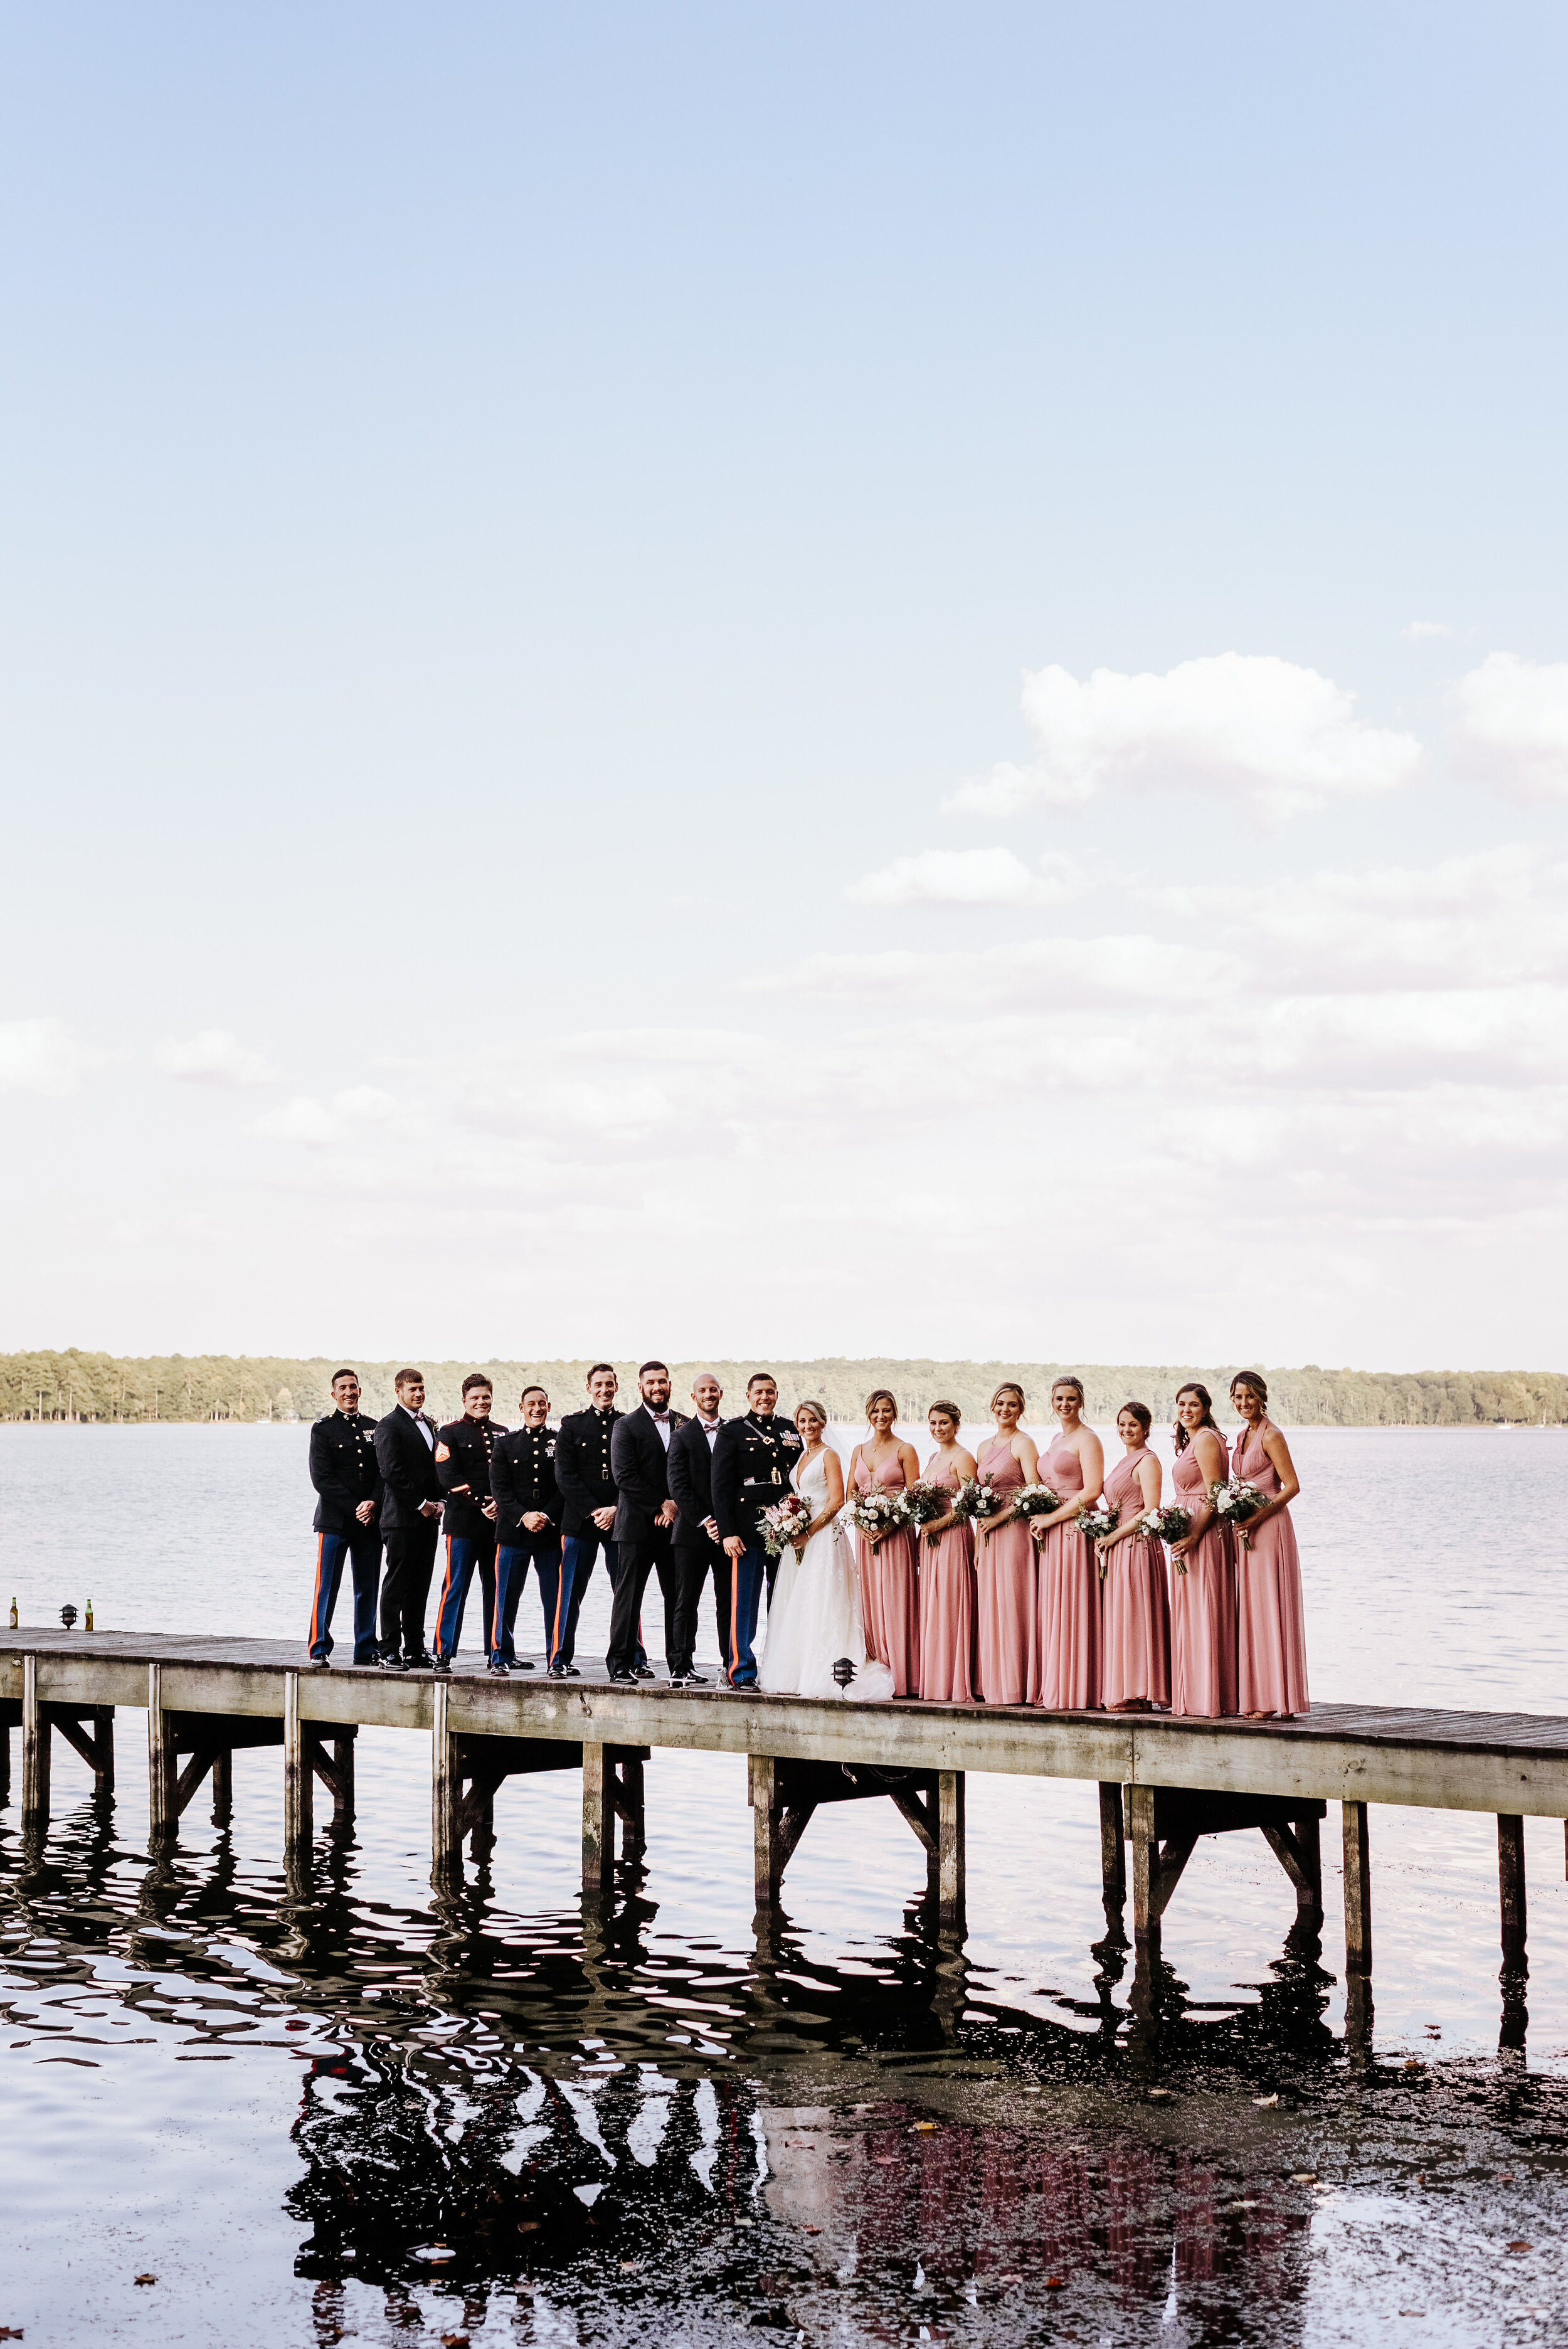 Emily_Mike_Wedding_Celebrations_at_the_Reservoir_Pool_Pavilion_Richmond_Virginia_Wedding_Photographer_Photography_by_V_62.jpg